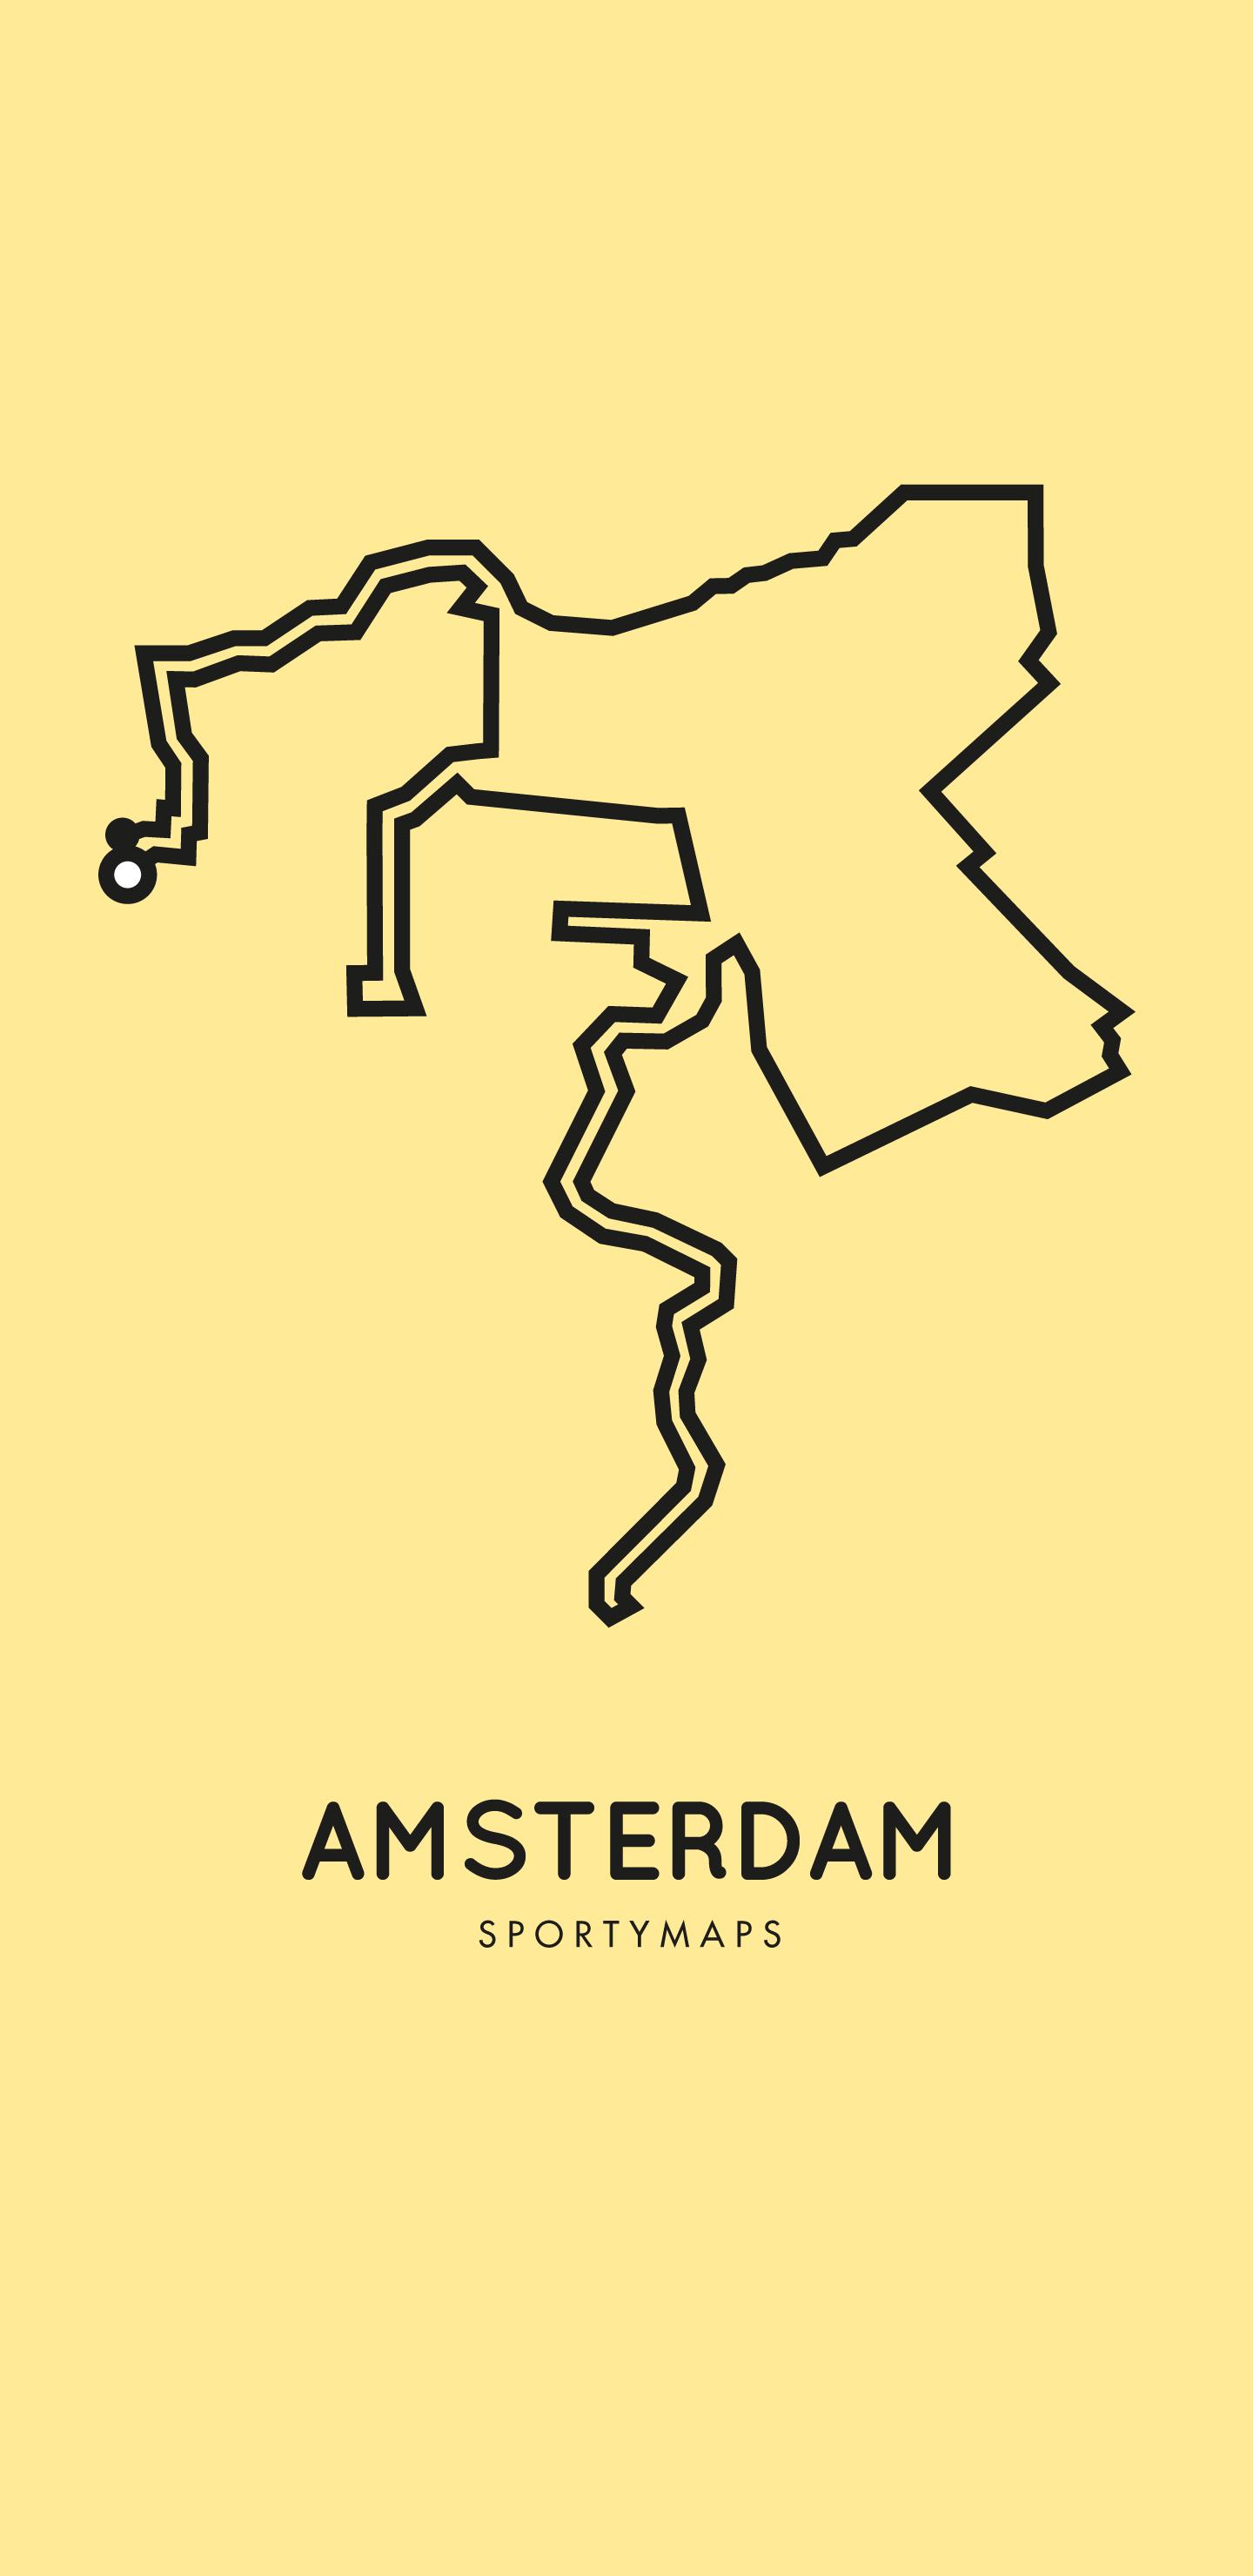 Sportymaps-Amsterdam-marathon-yellow